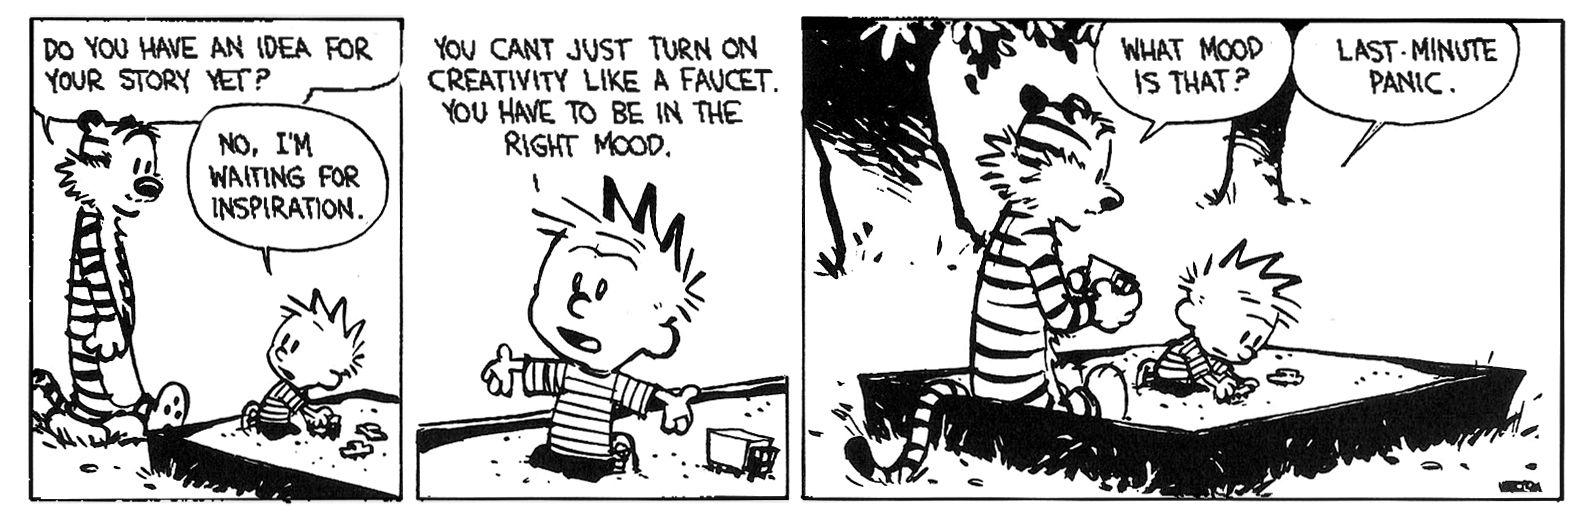 Last Minute Panic Writing Calvin Hobbes Comics Calvin Hobbes